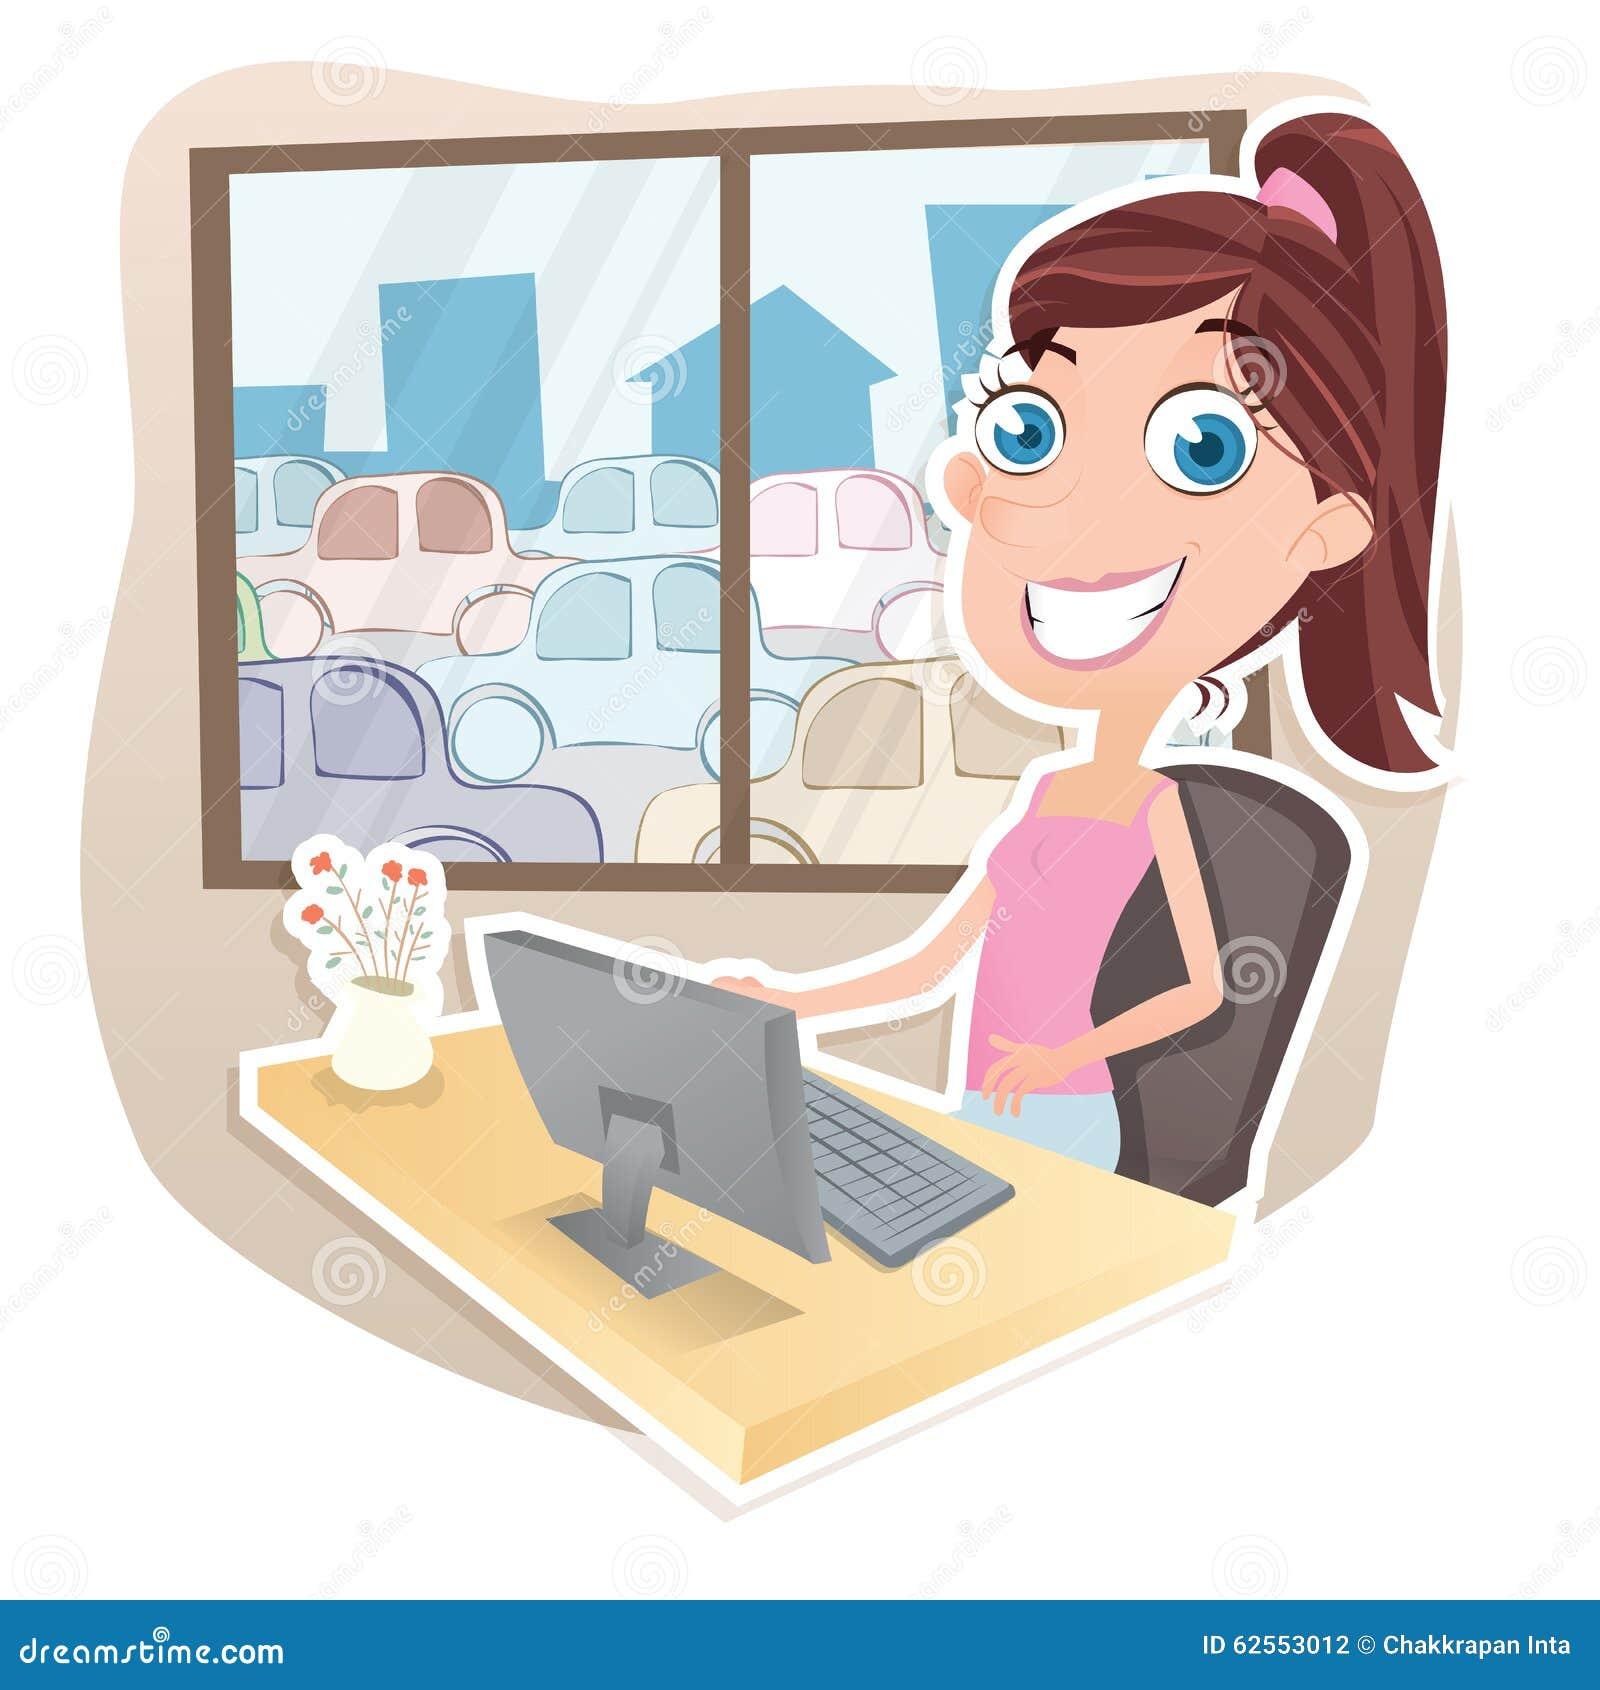 work-home-cartoon-girl-working-computer-her-62553012.jpg